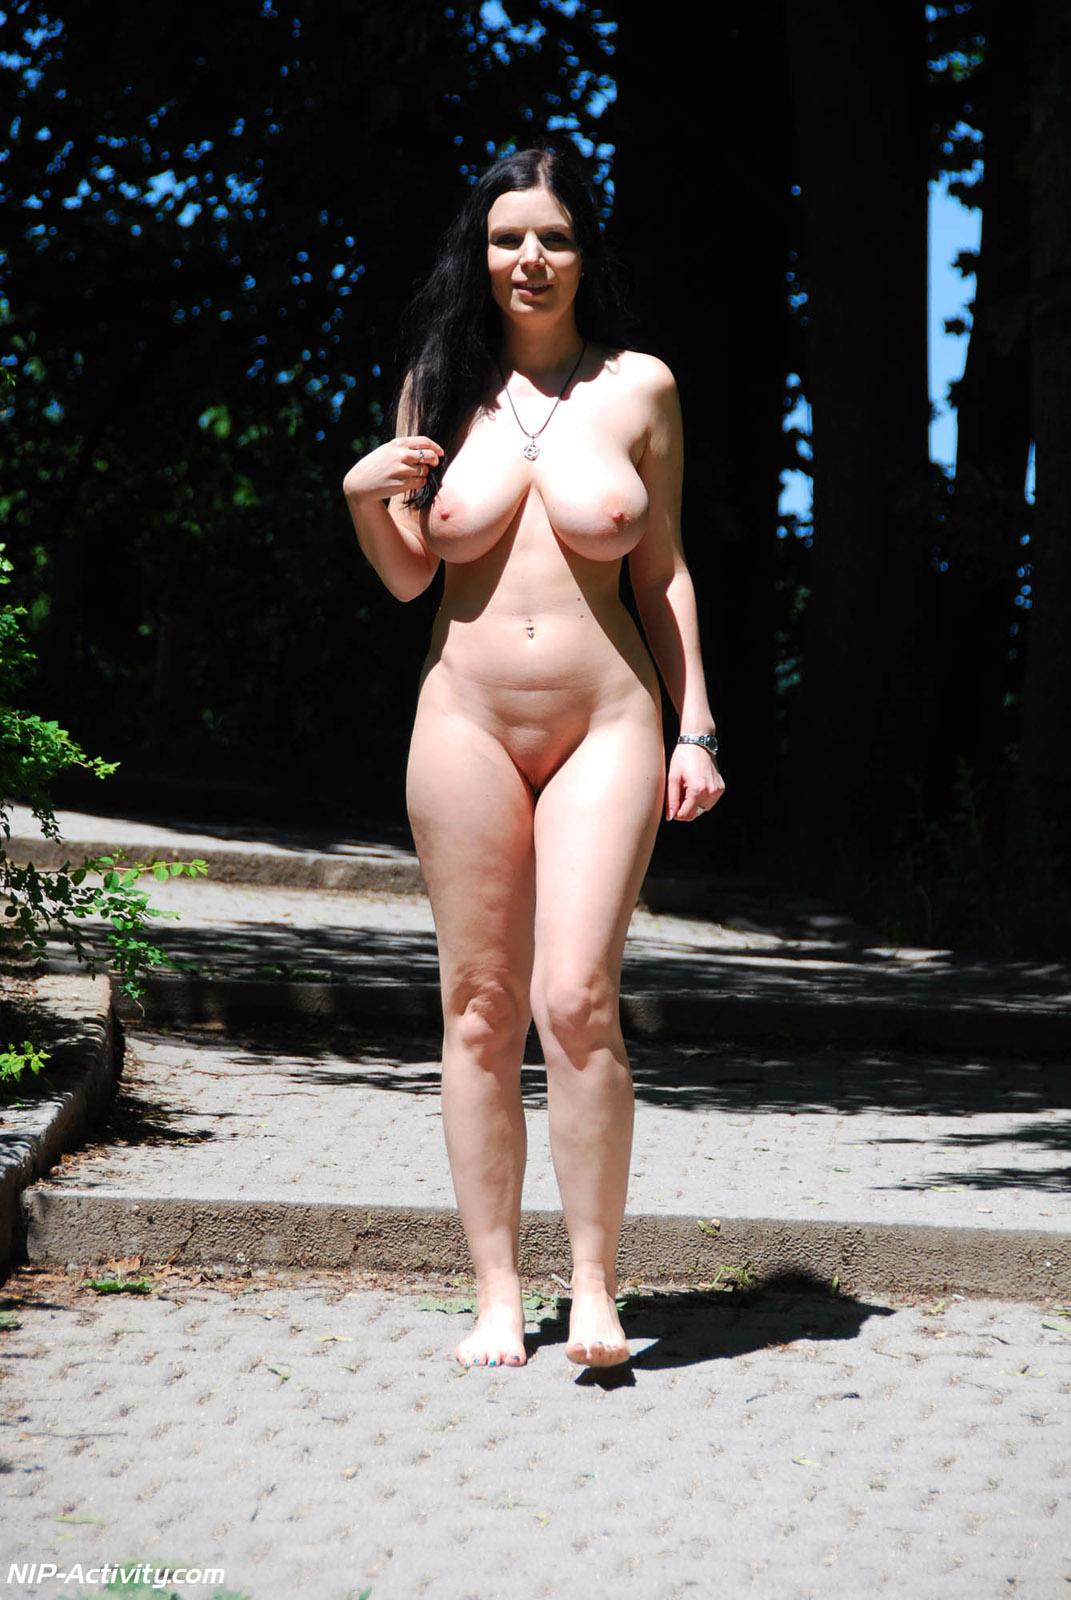 Nip activity in nude public sorry